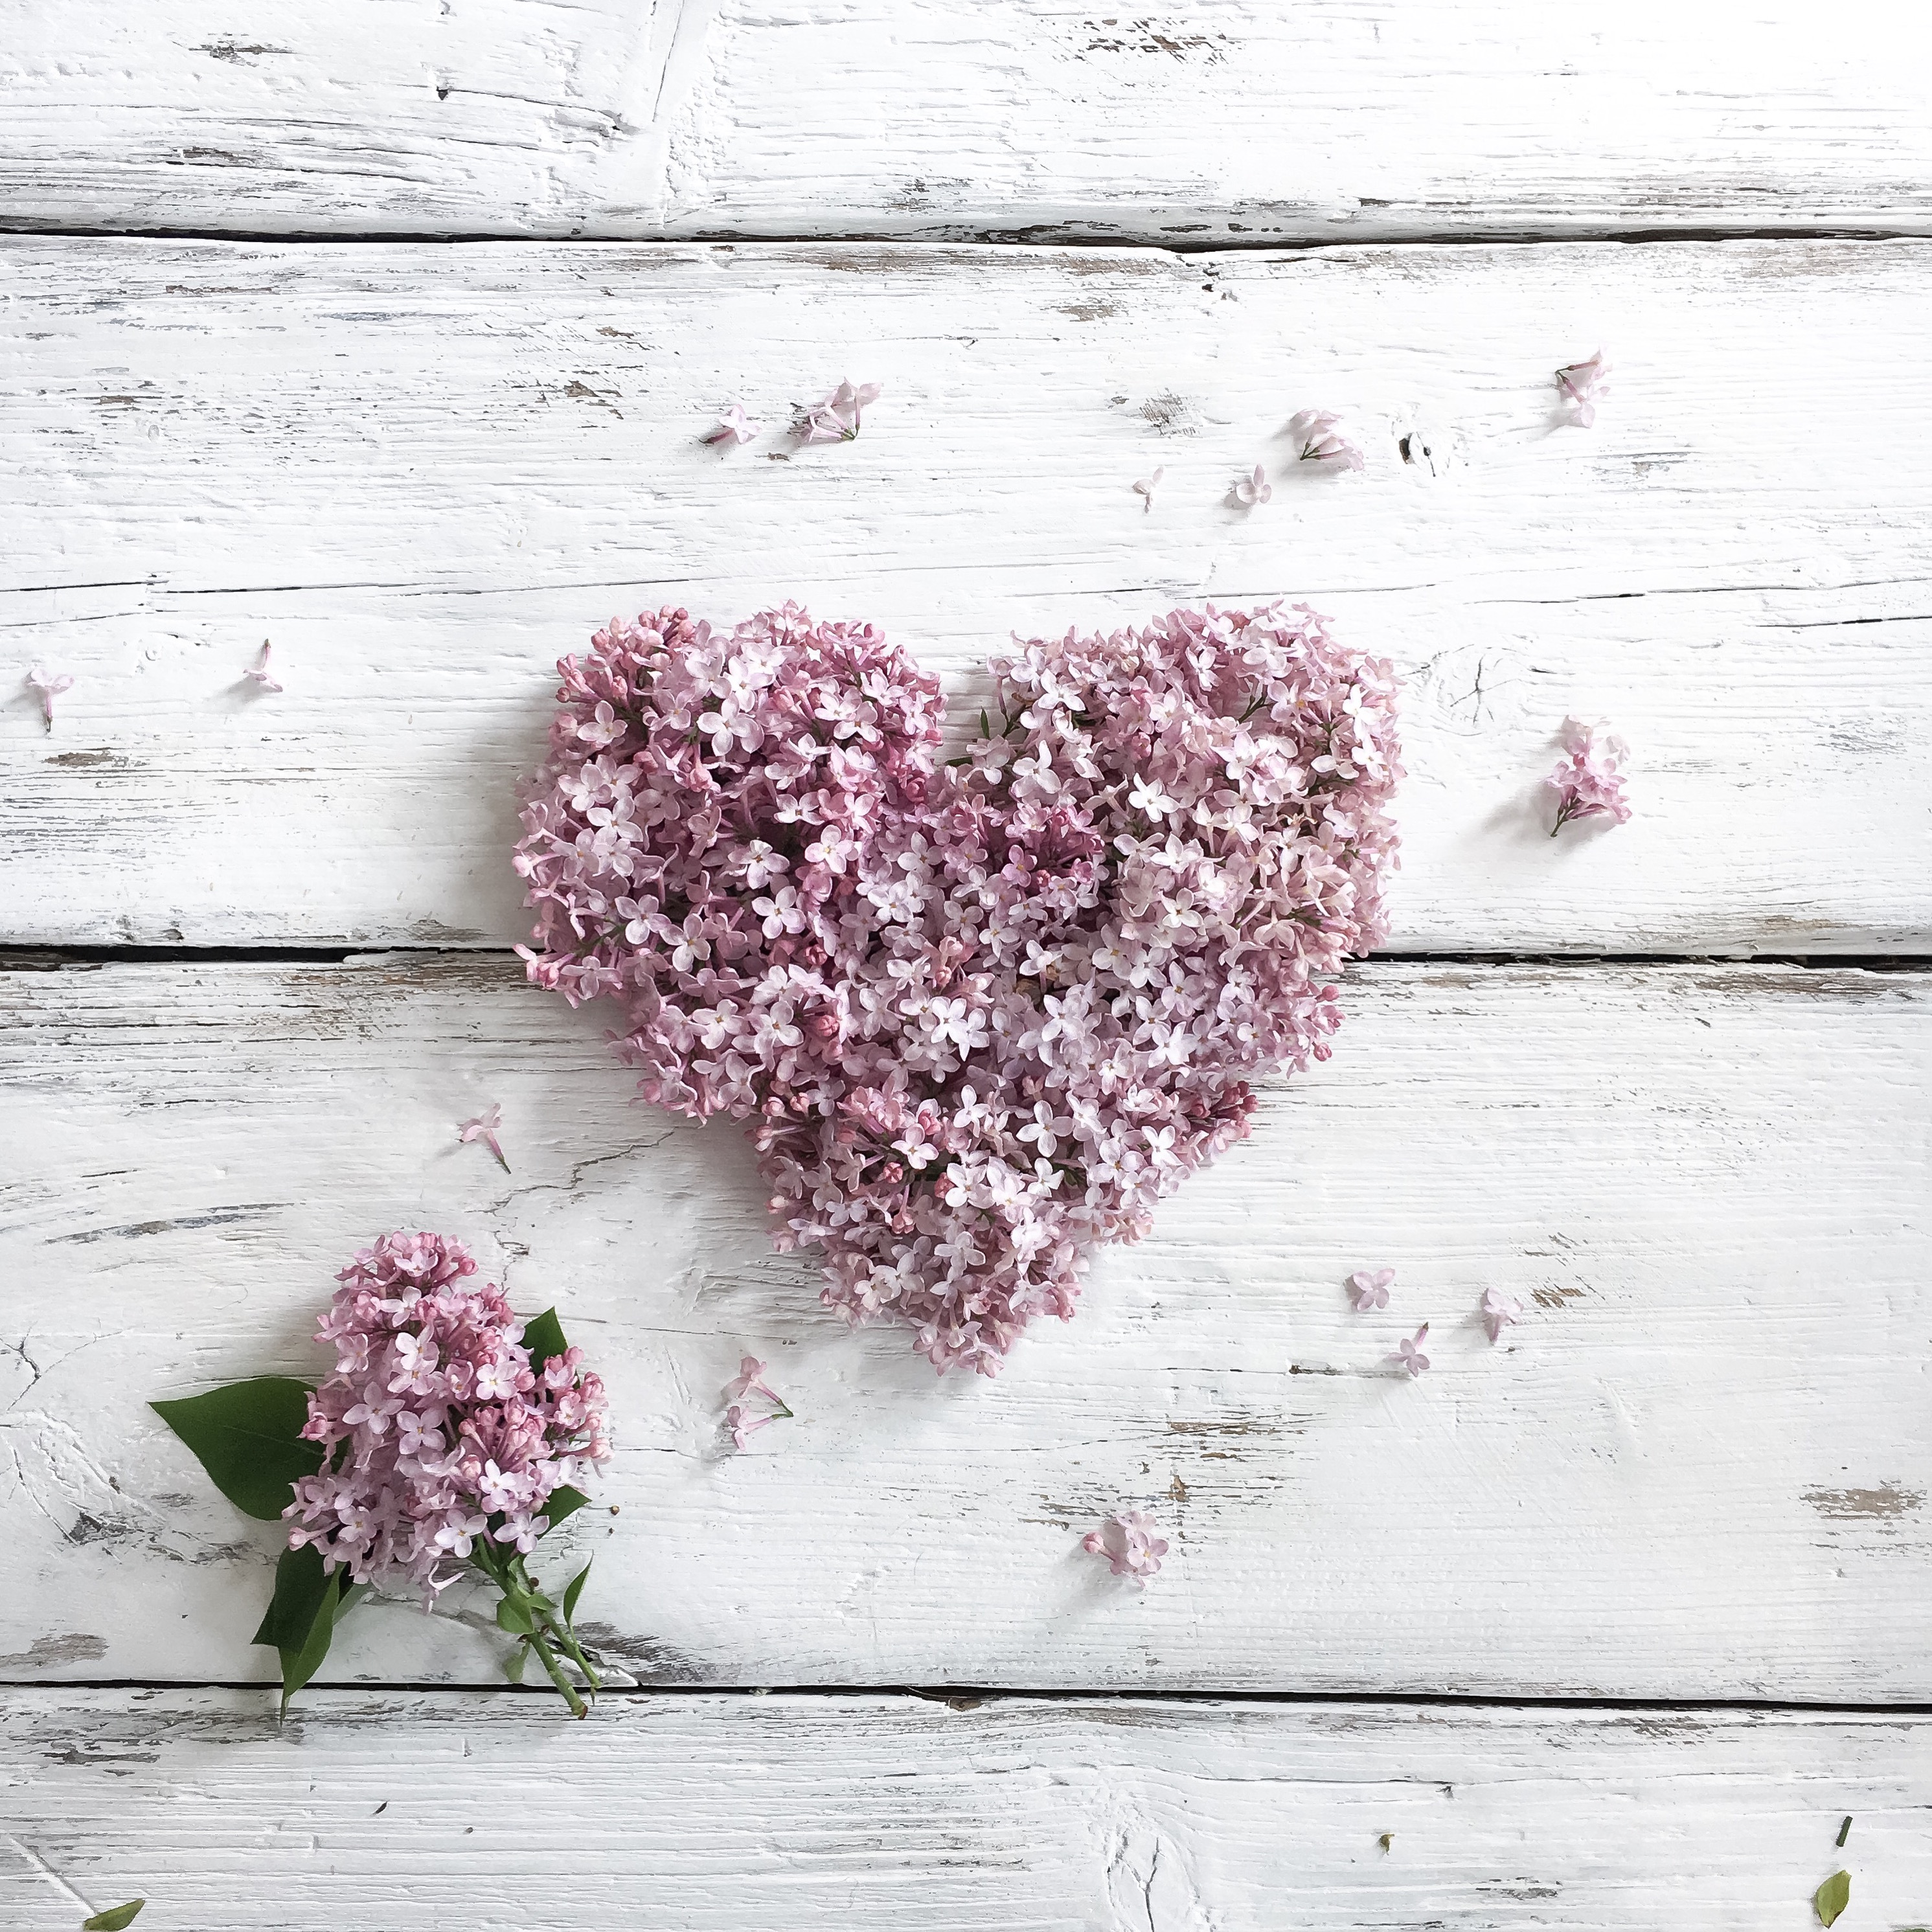 lilac heart Instagram clichés